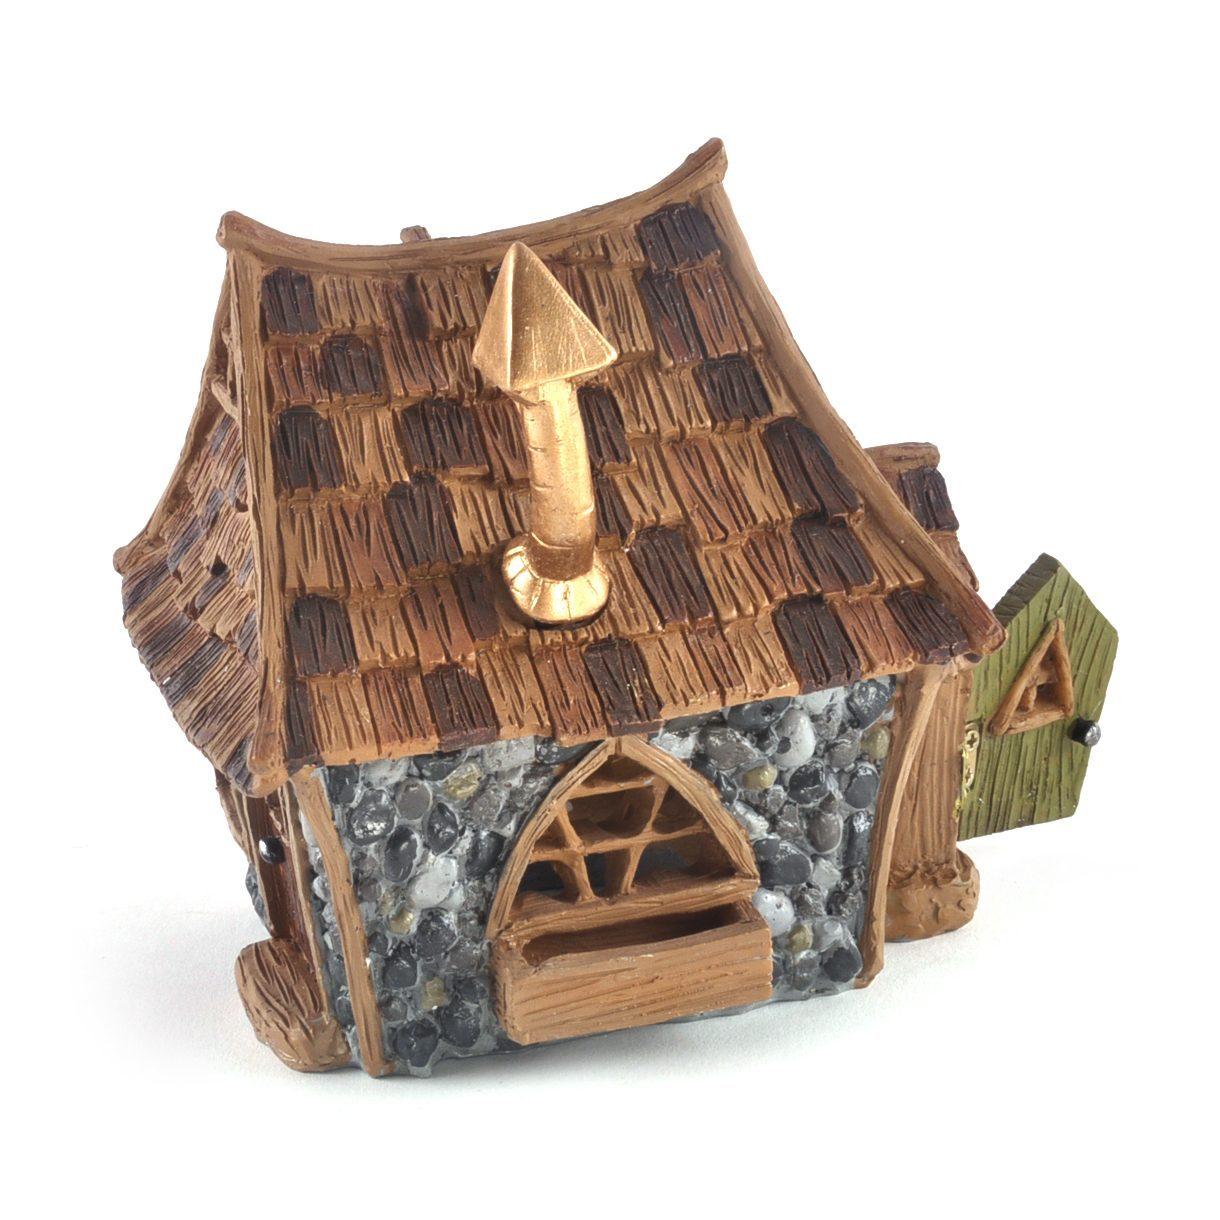 Shingle Town Fairy Garden Miniature